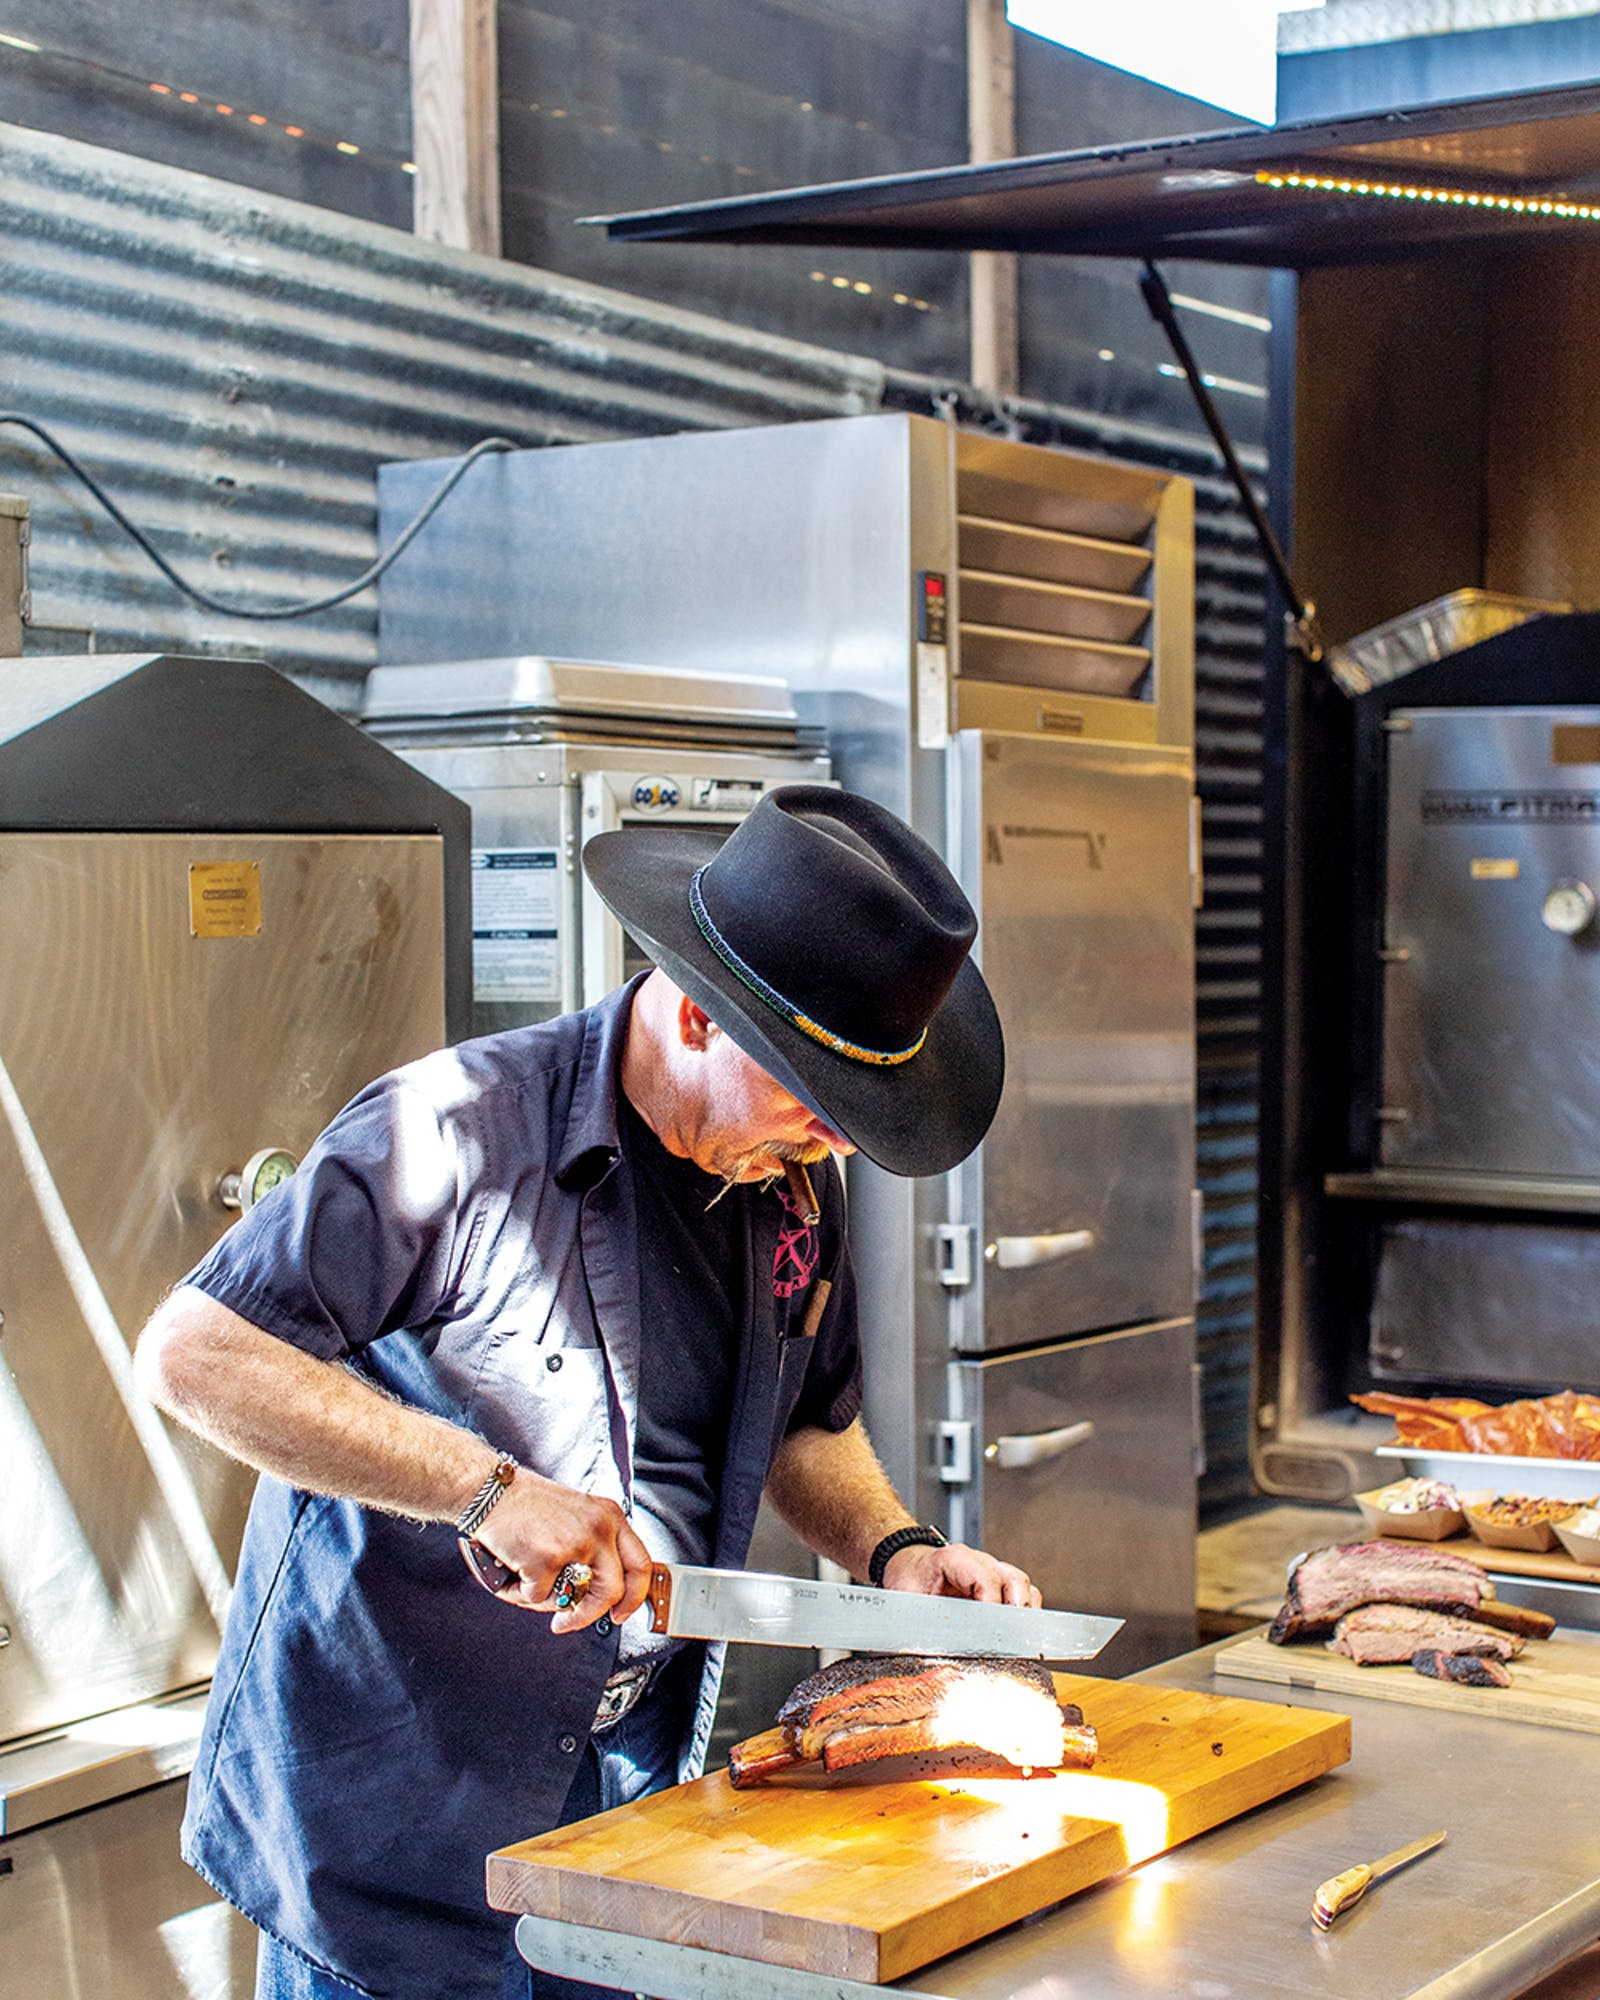 Harlem Road Texas BBQ's pitmaster Ara Malekian slicing beef ribs.